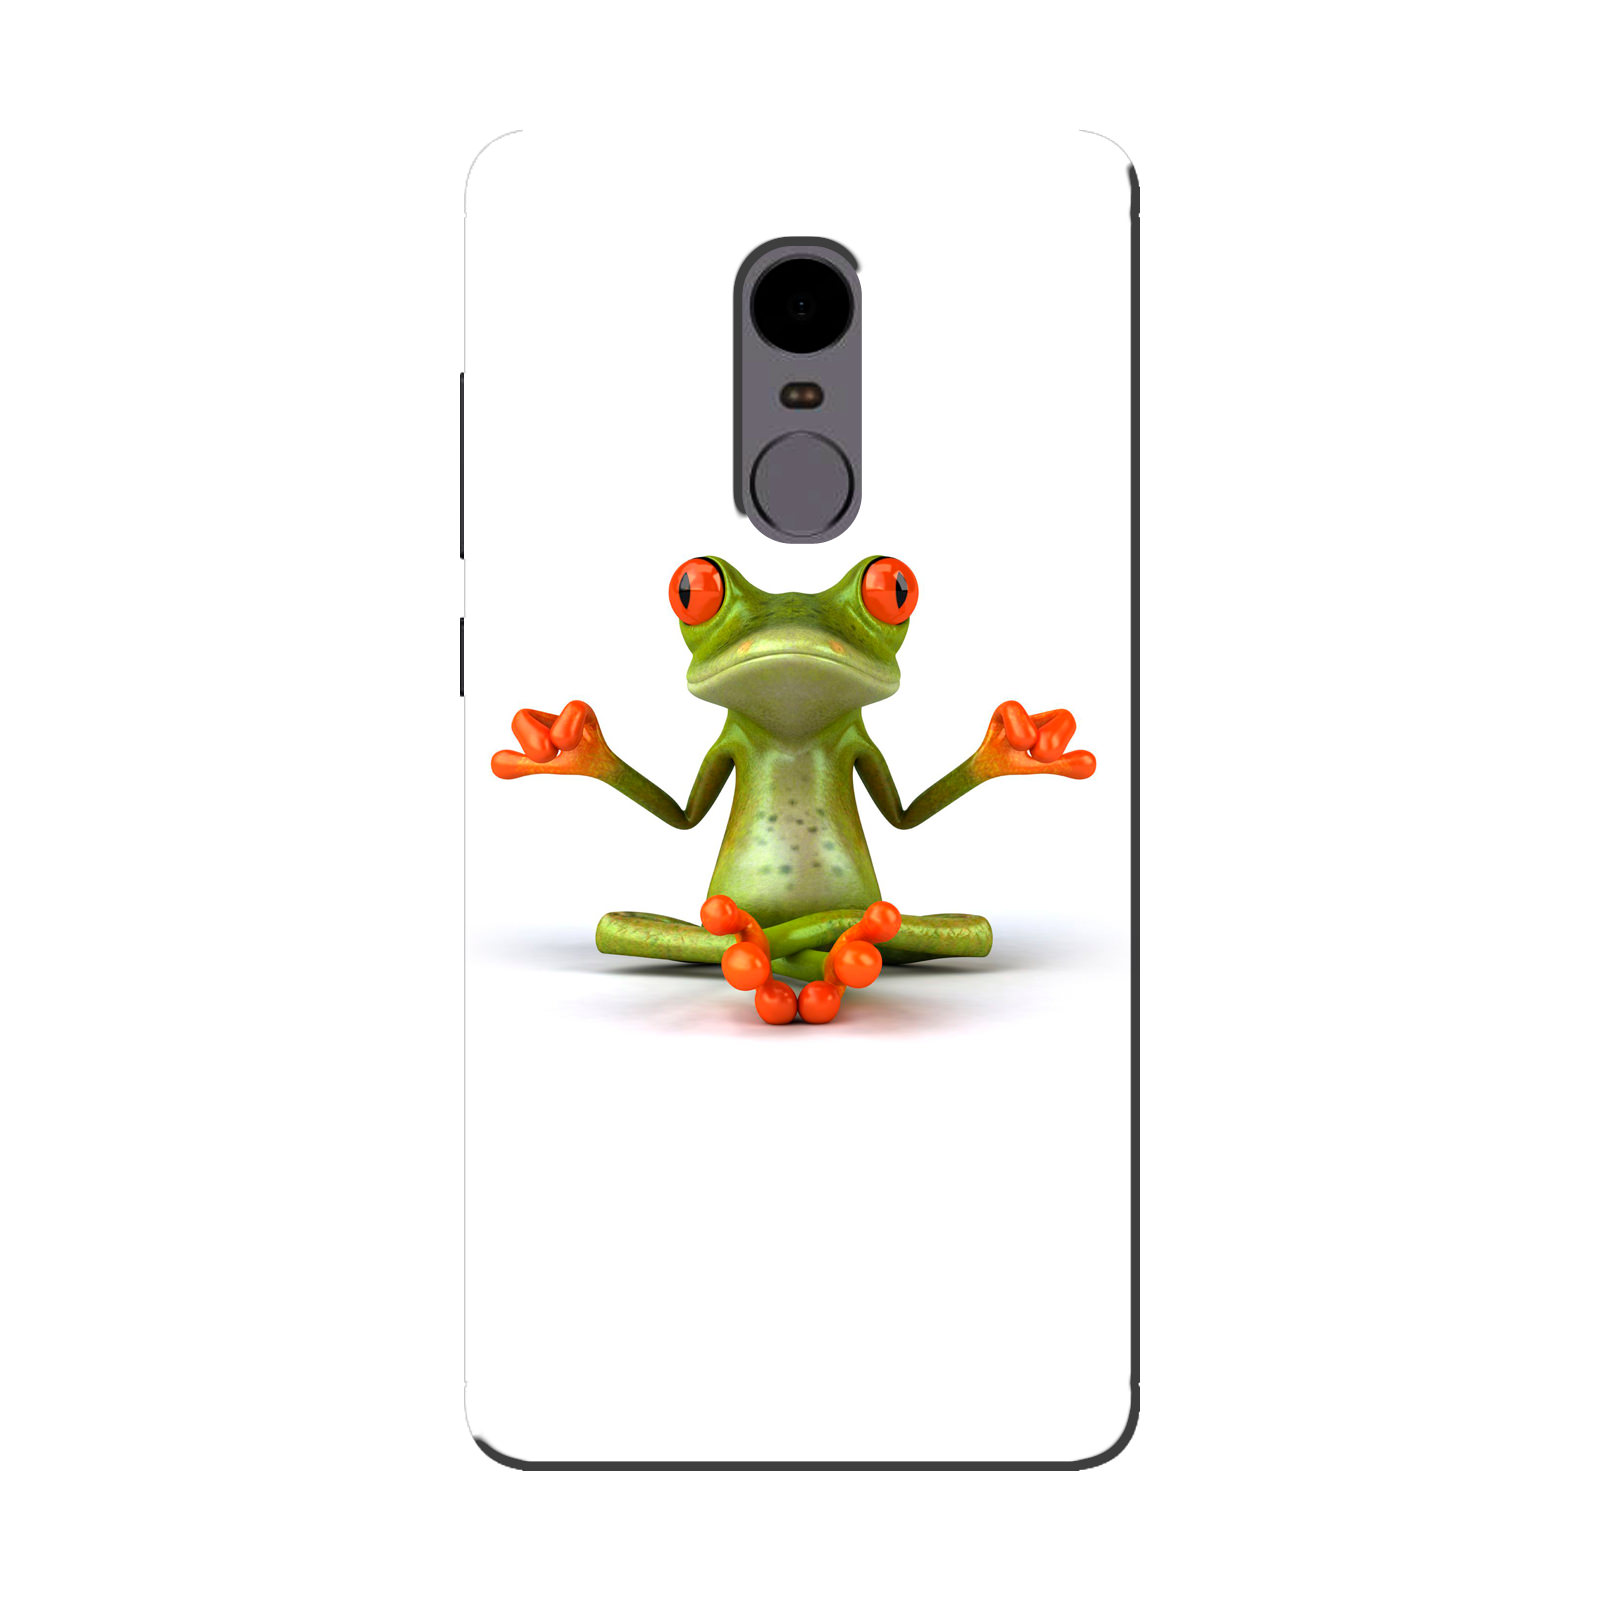 sairafashions Wild Thunder Mi Redmi Note 4 Mobile Back Cover Case And Designer Printed Hard Flexible Mobile Case Cover  - 1132